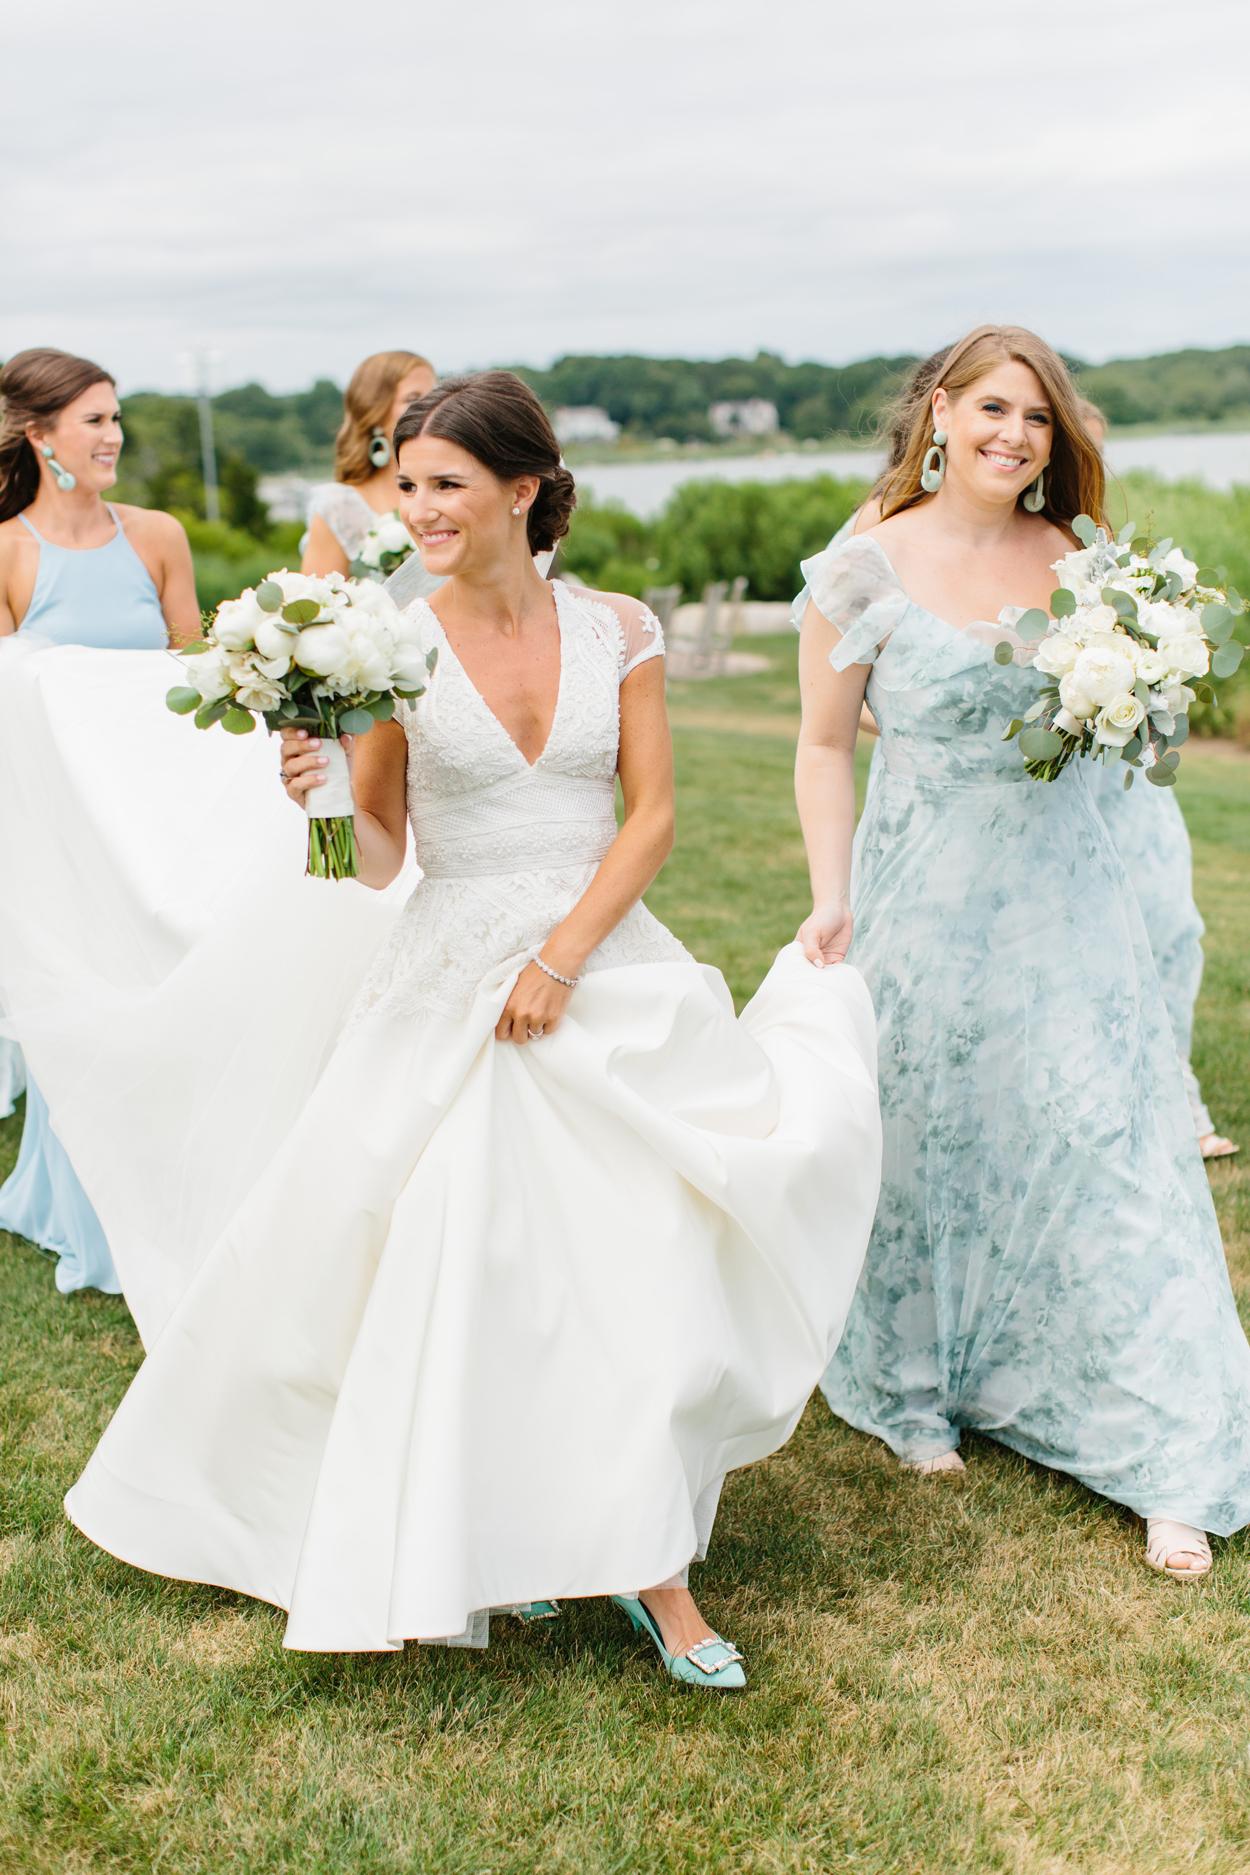 bride wearing v-neck cap sleeve wedding dress